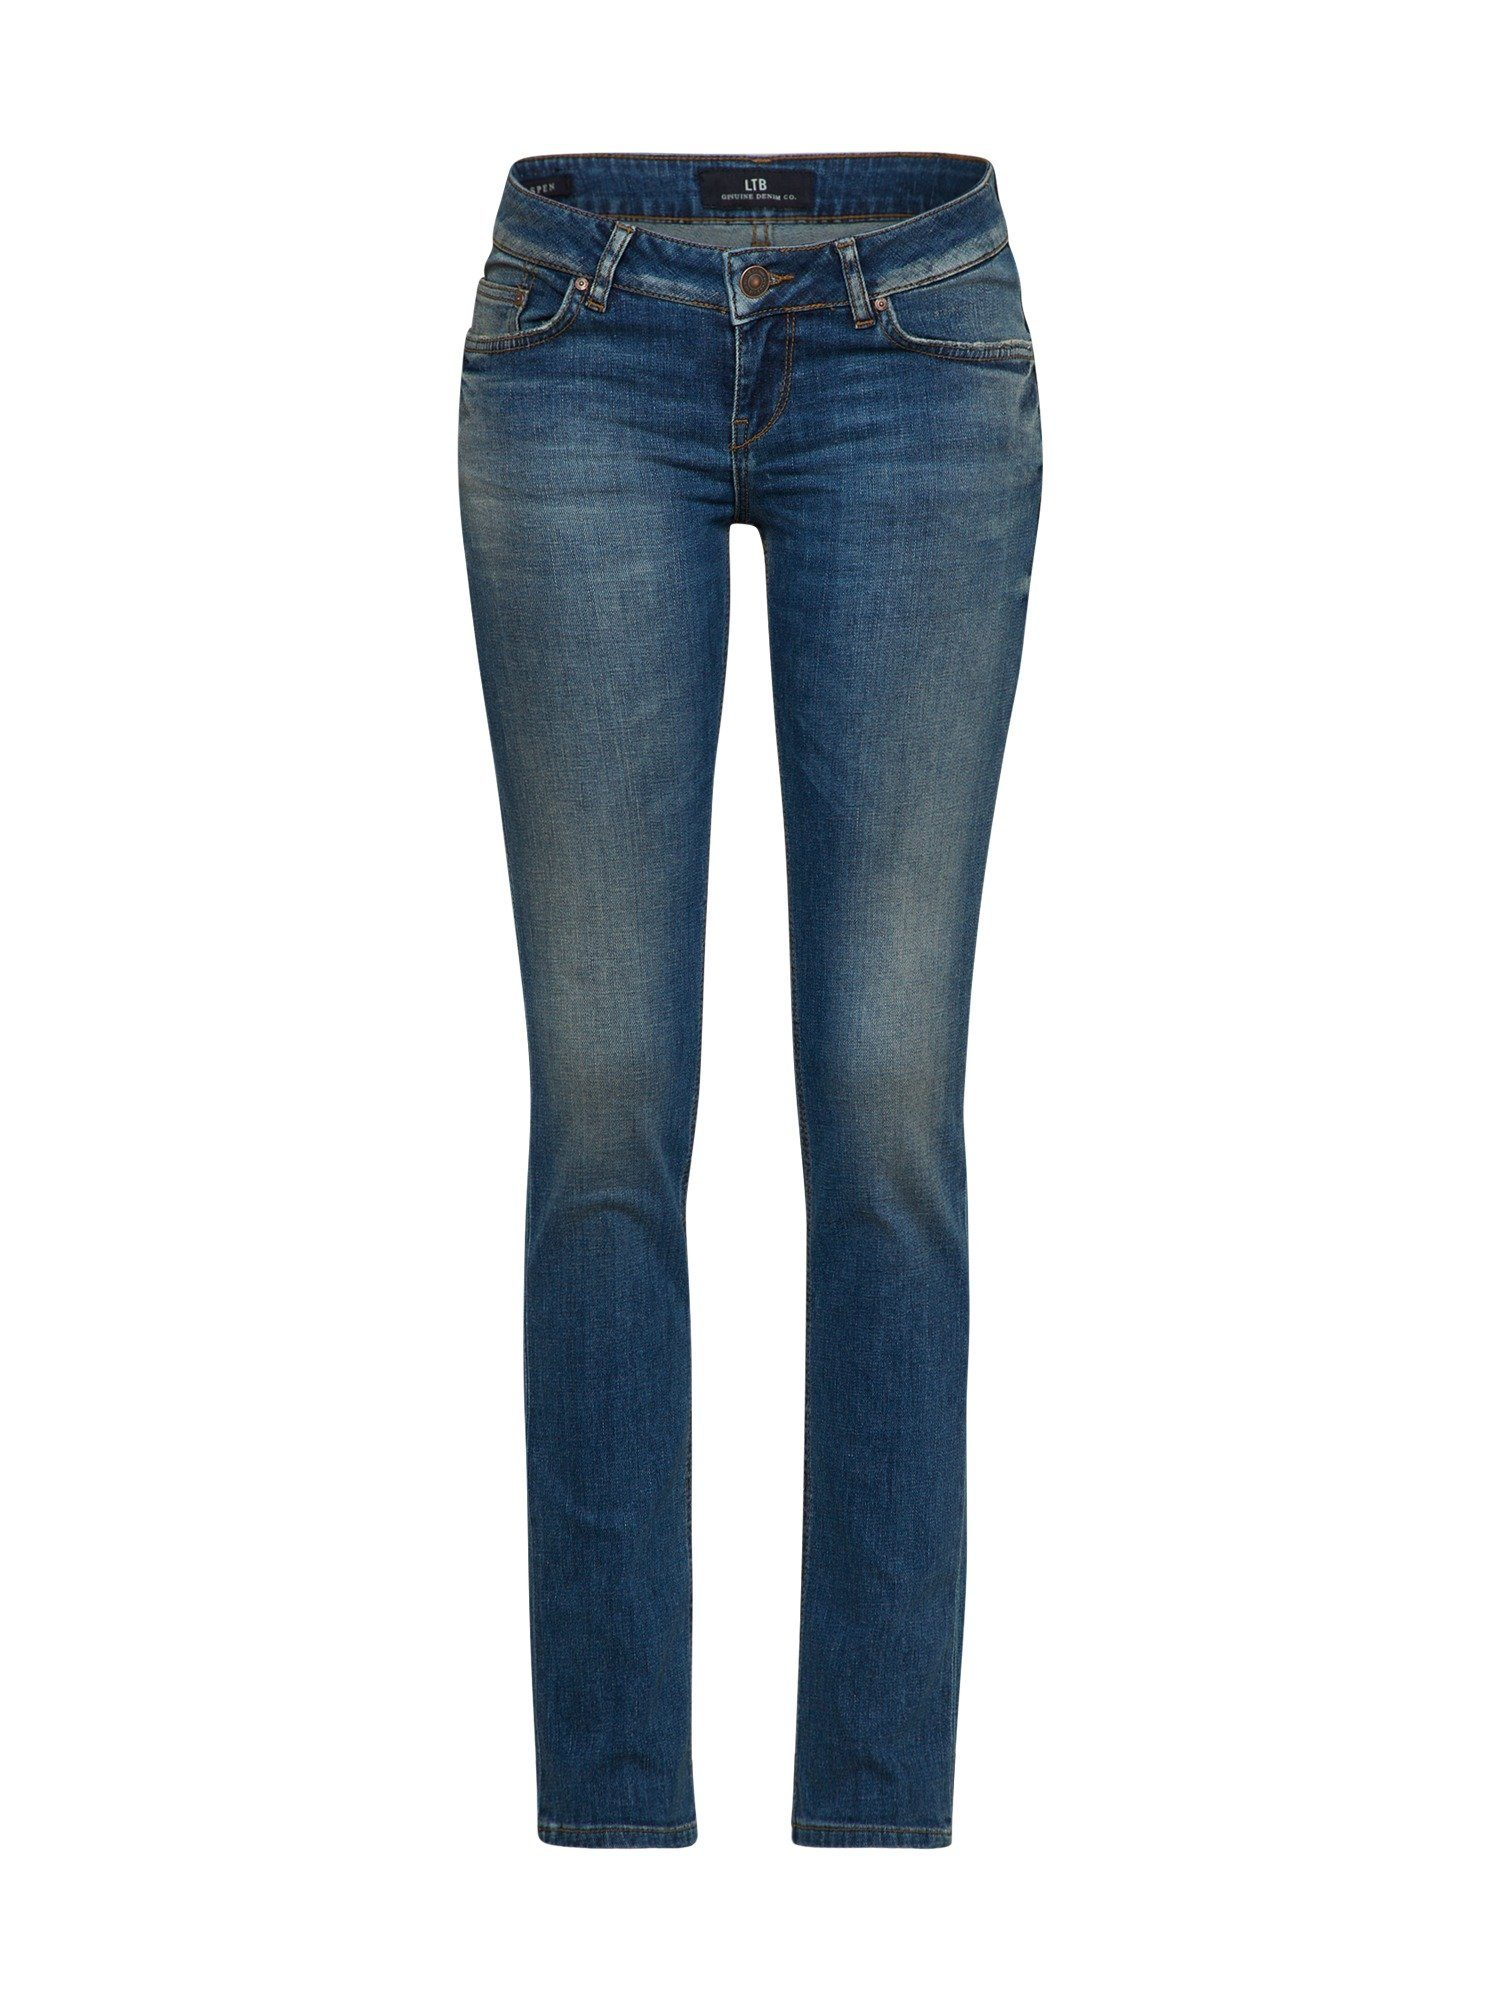 LTB Slim fit Jeans »Aspen«, 5 Pocket Style online kaufen   OTTO